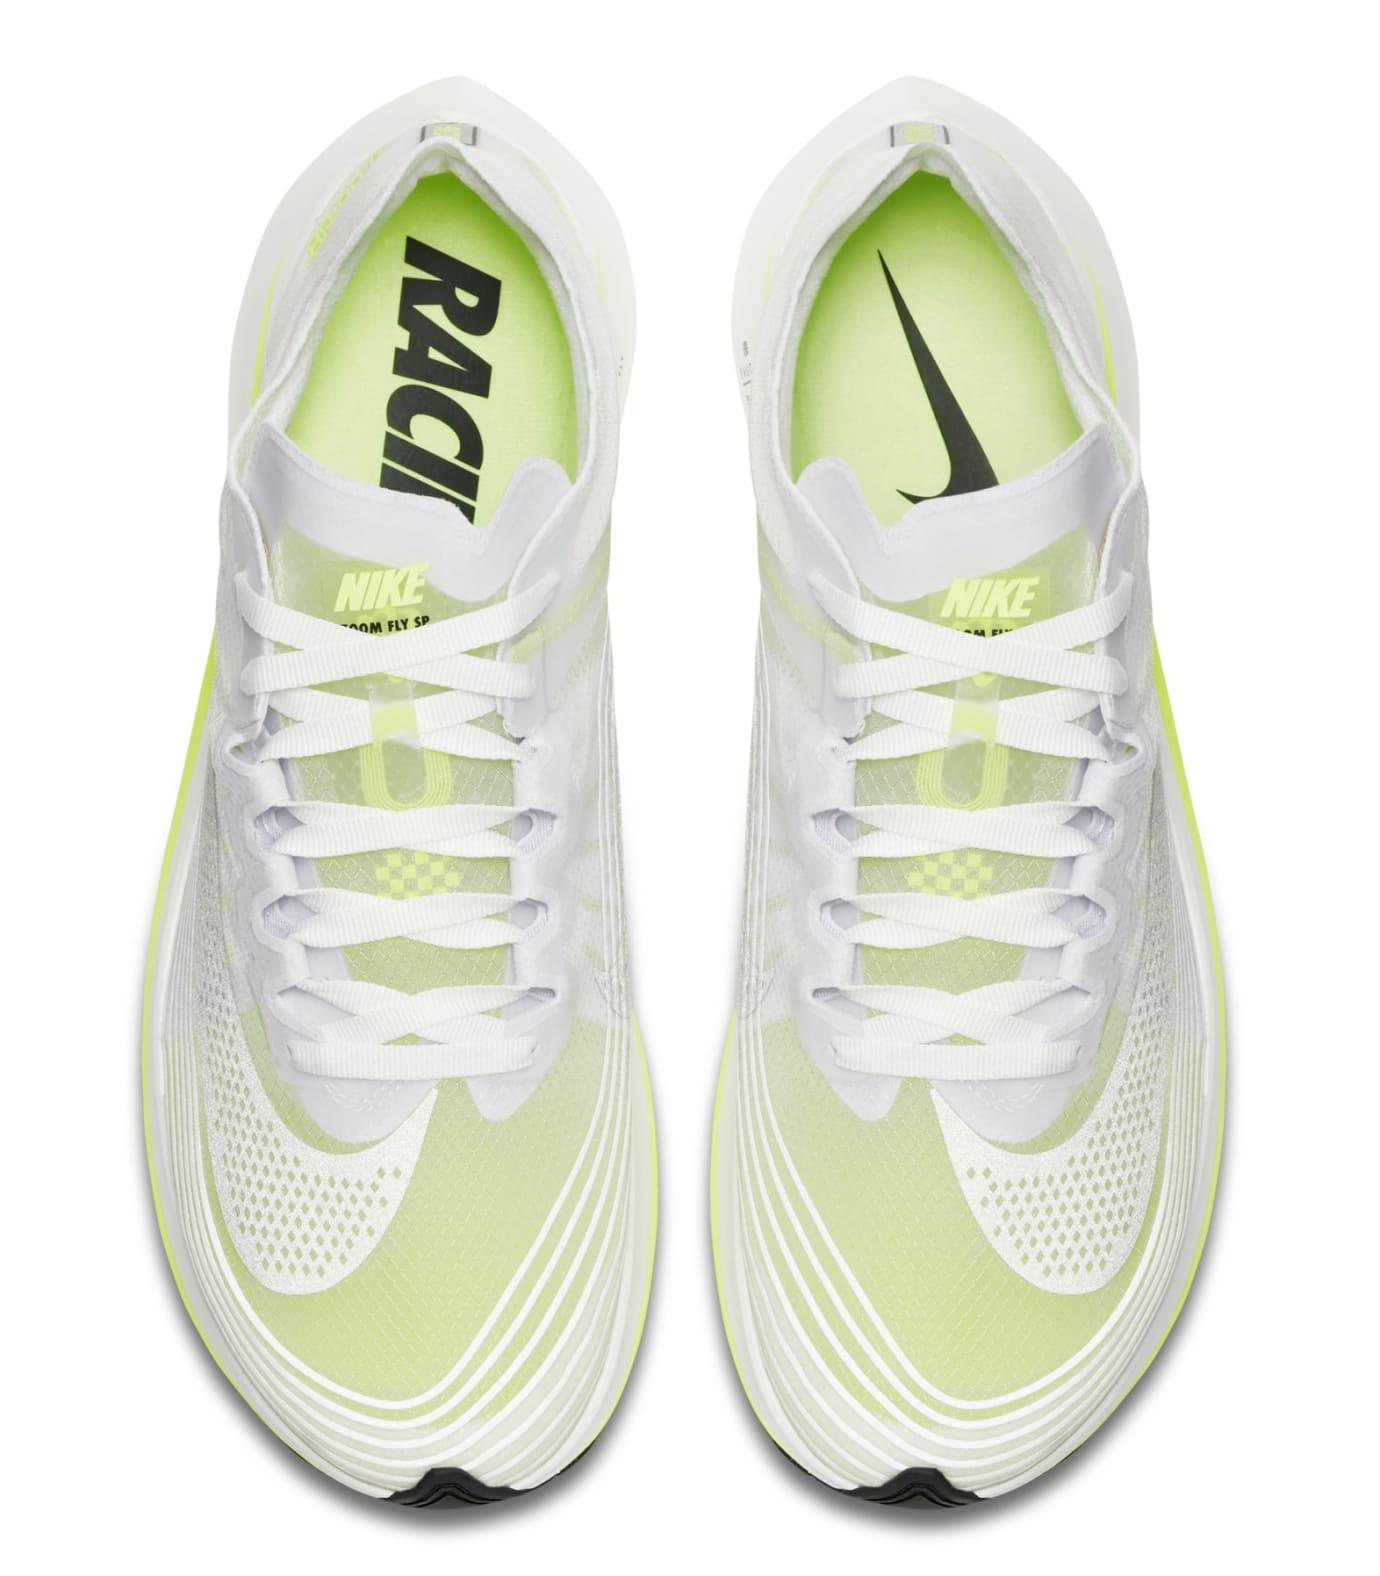 Nike Zoom Fly SP 'White/Volt/Glow' AJ9282-107 (Top)